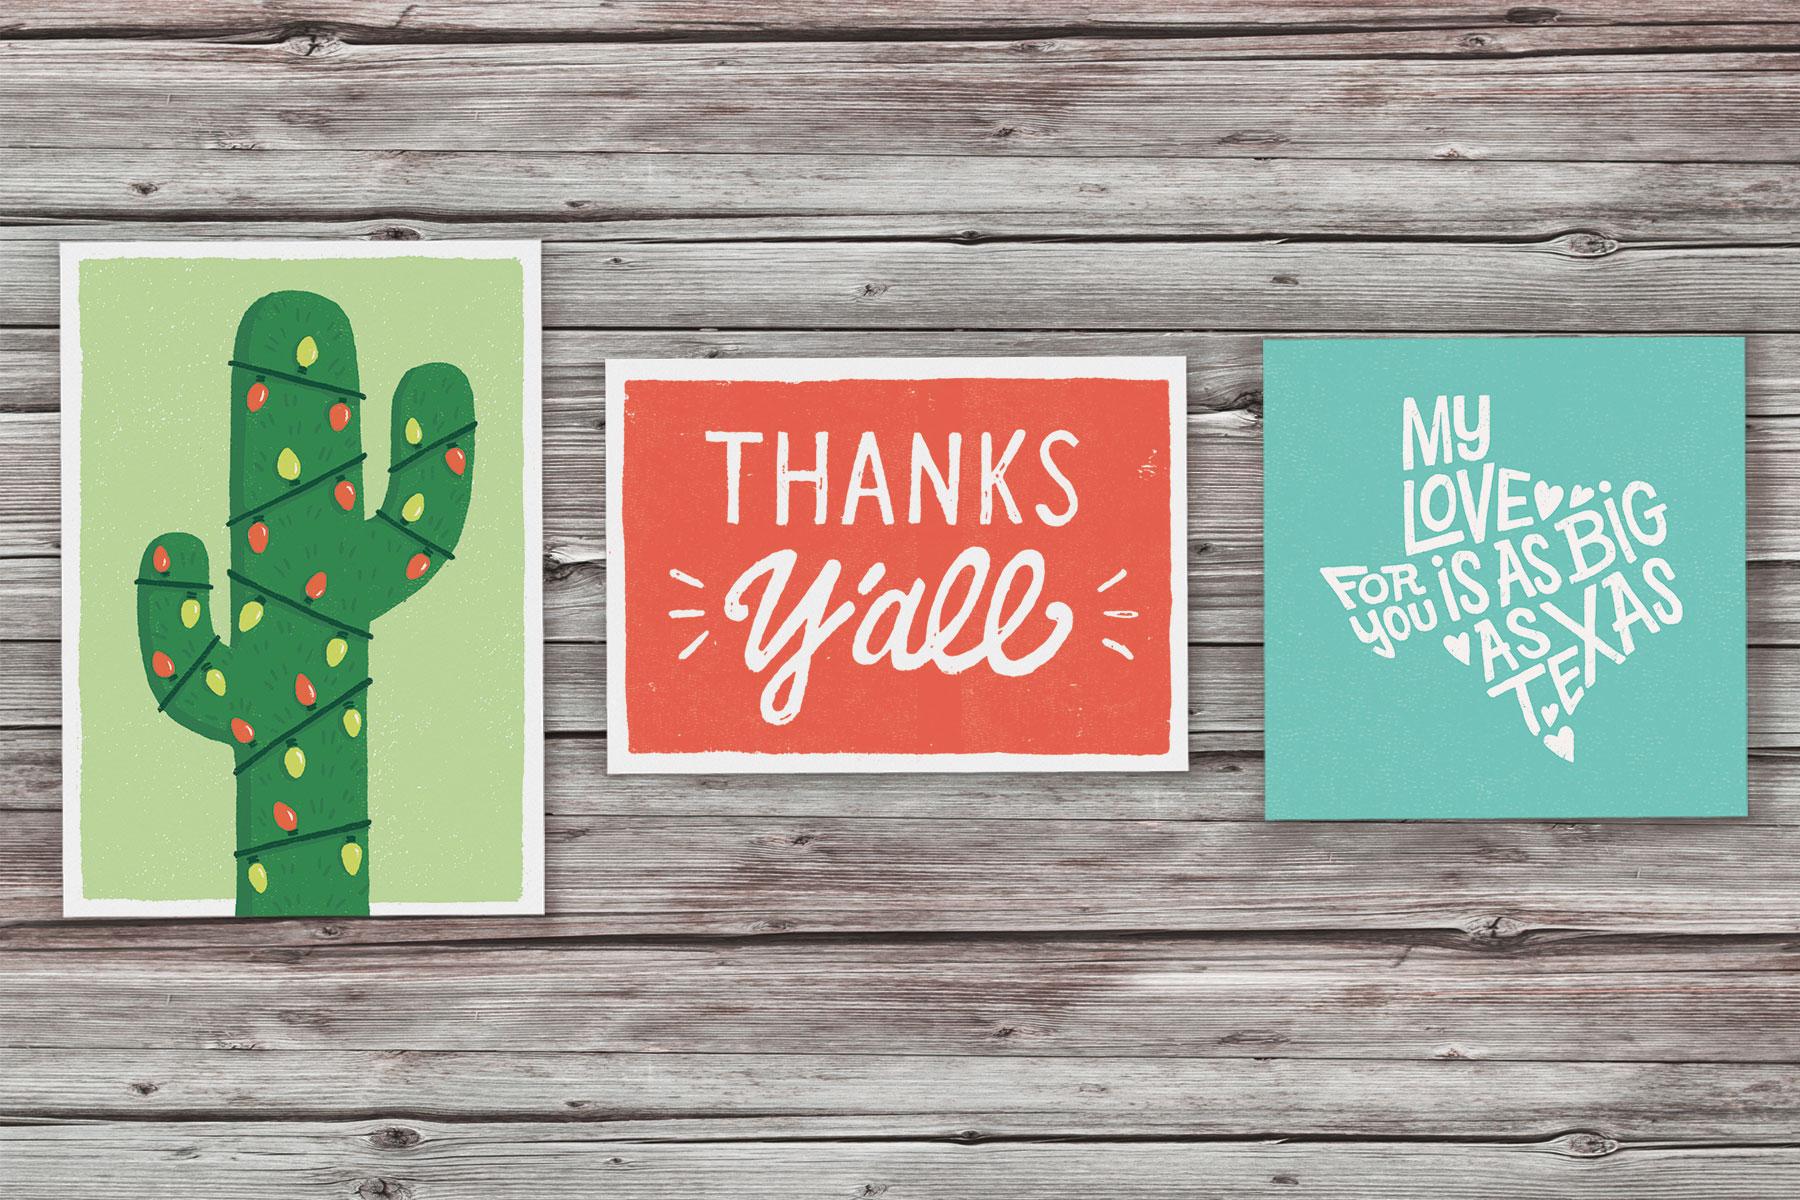 Texas born wed chula league cherrywood art fair various greeting cards 4 color printing premium paper 4x6 5x7 m4hsunfo